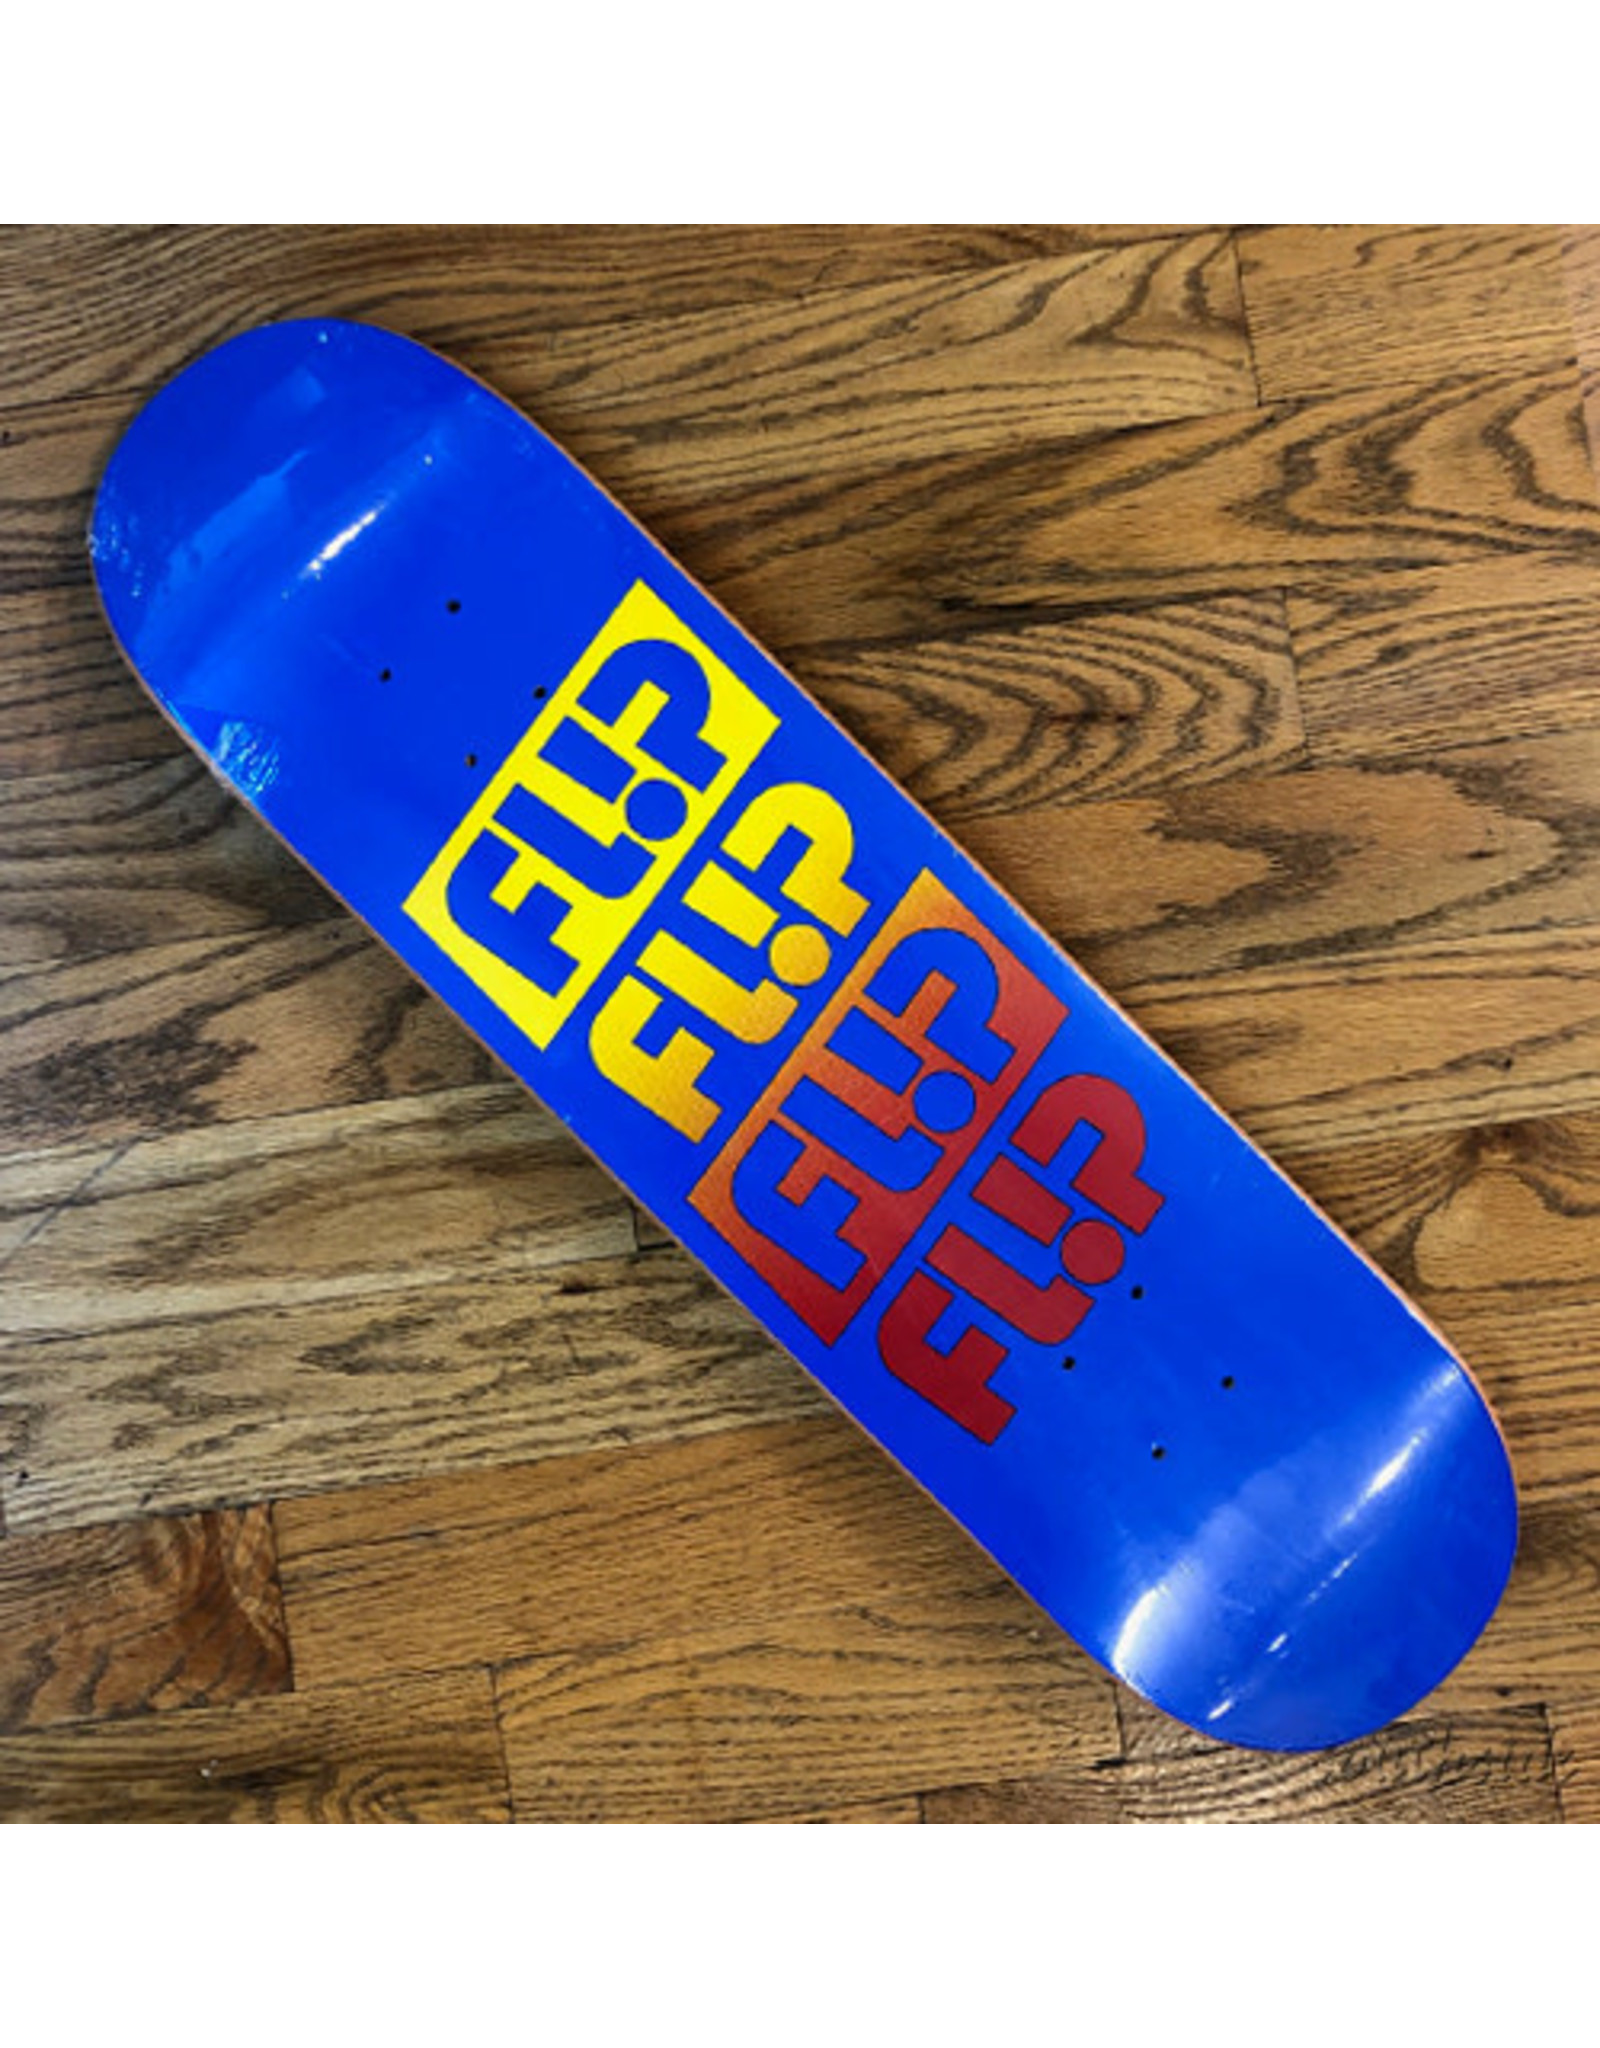 Flip Deck Odyssey Fader Blue 8.13x31.5